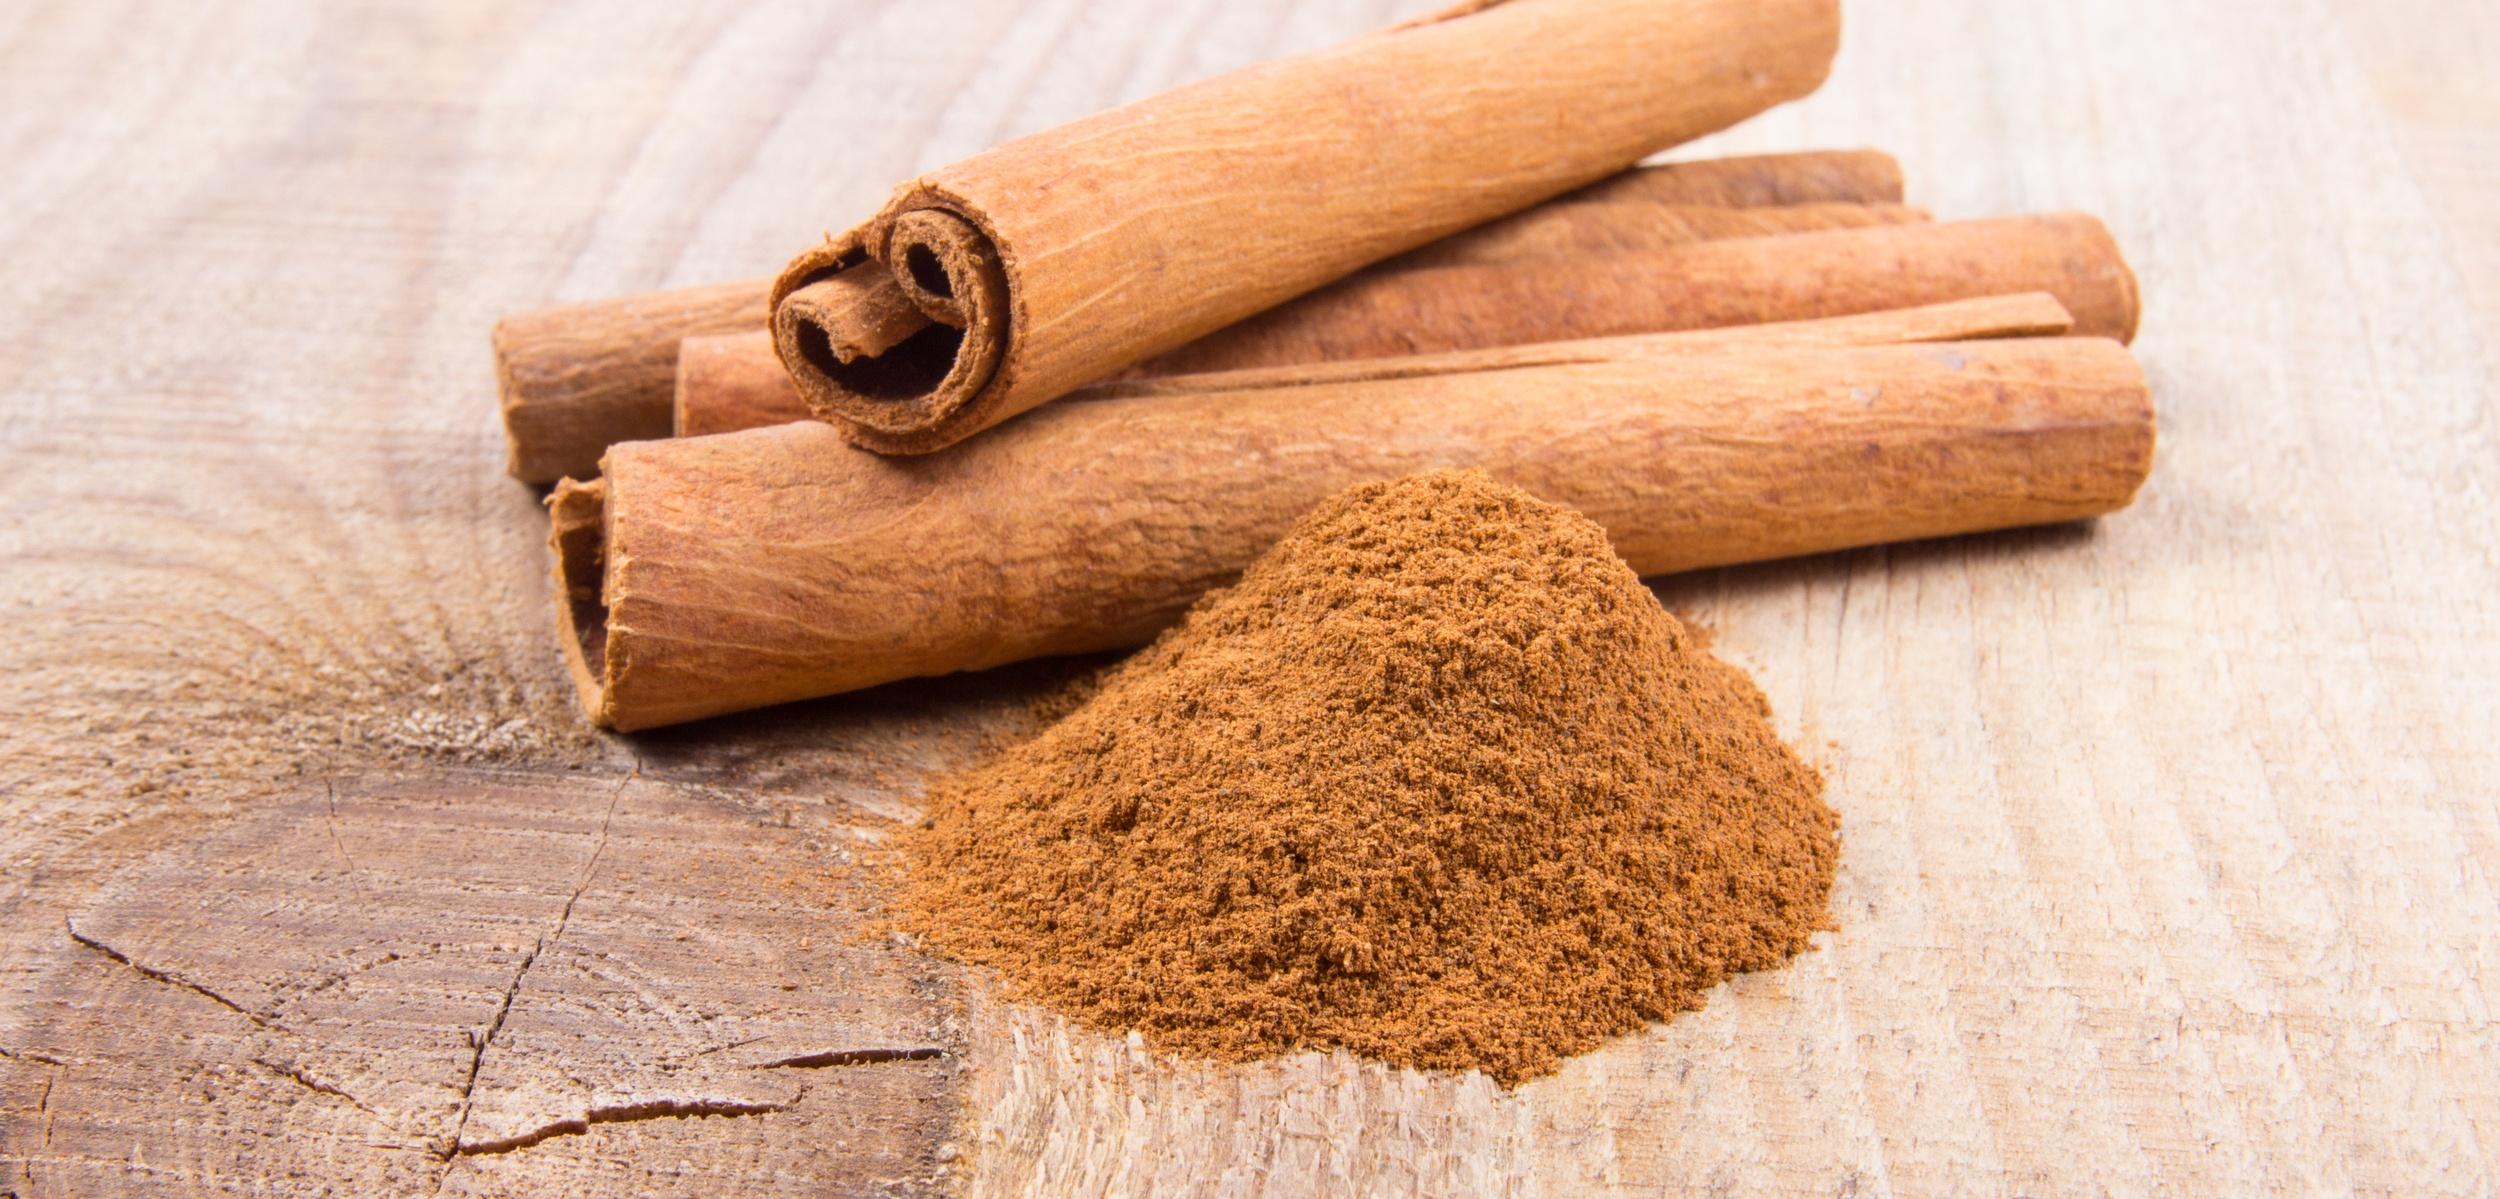 Cinnamon sticks laying on wooden block